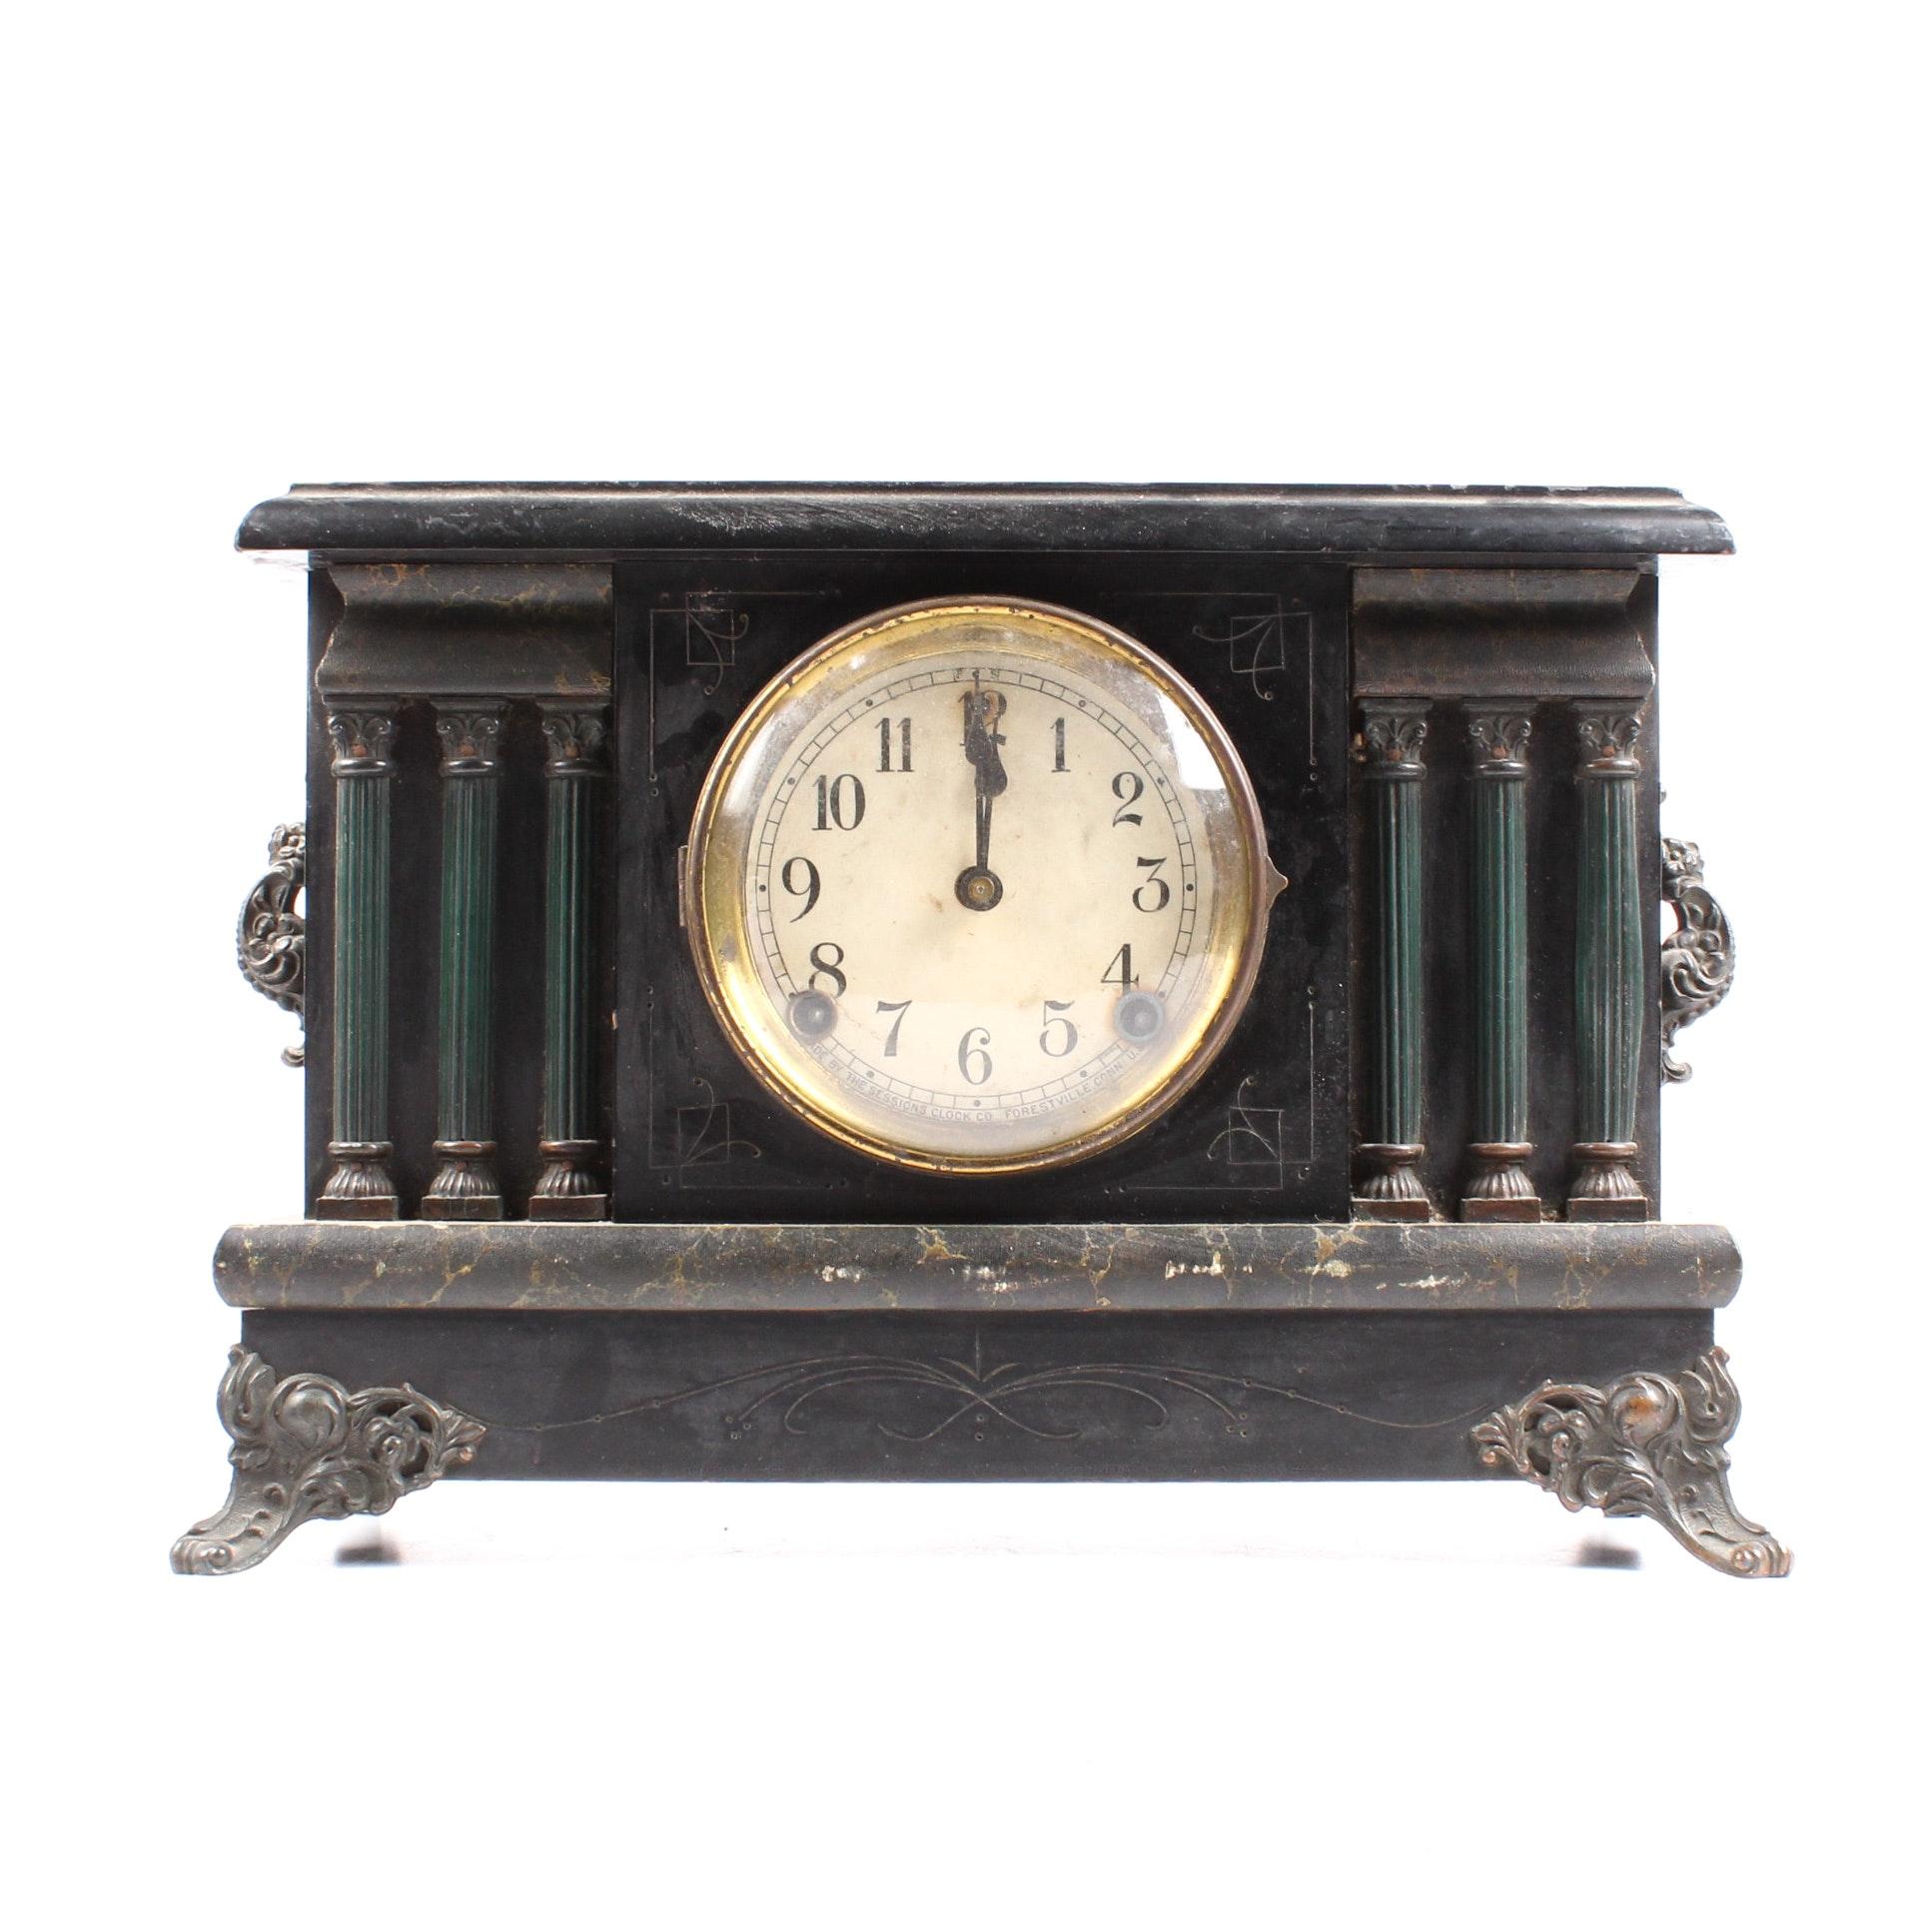 Antique Sessions Mantel Clock